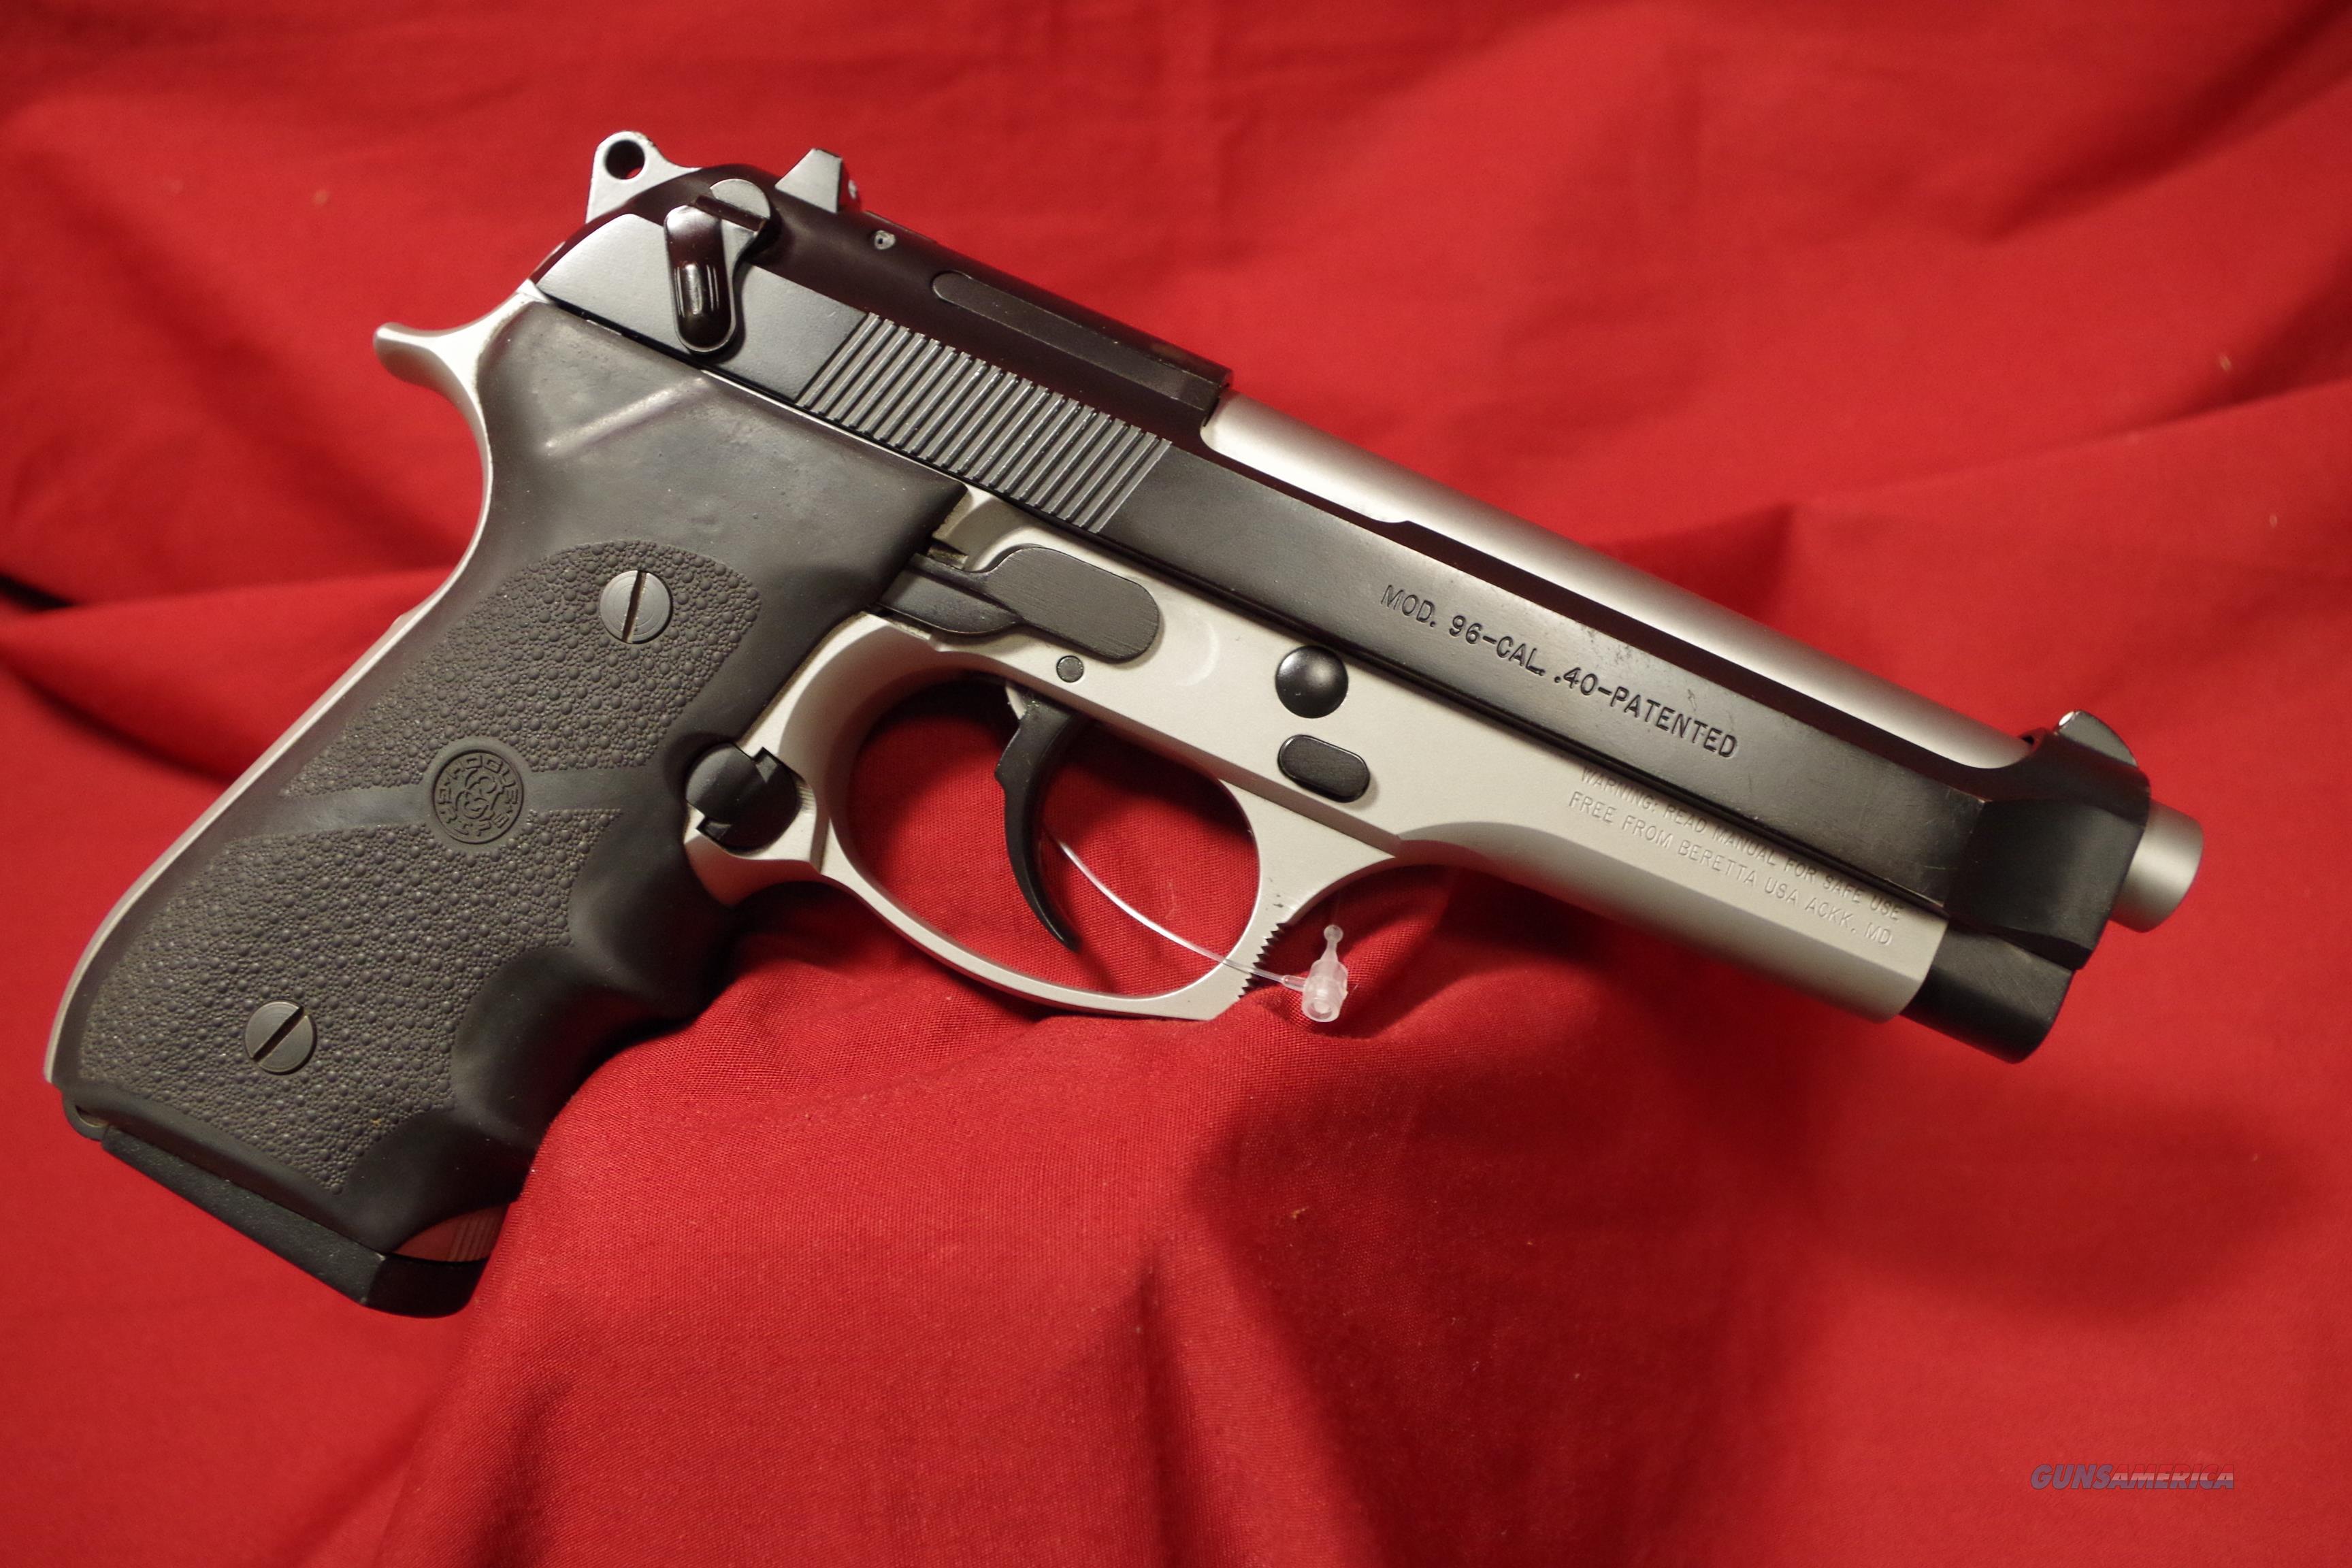 Beretta 96 40cal. usd pistol  Guns > Pistols > Beretta Pistols > Model 96 Series